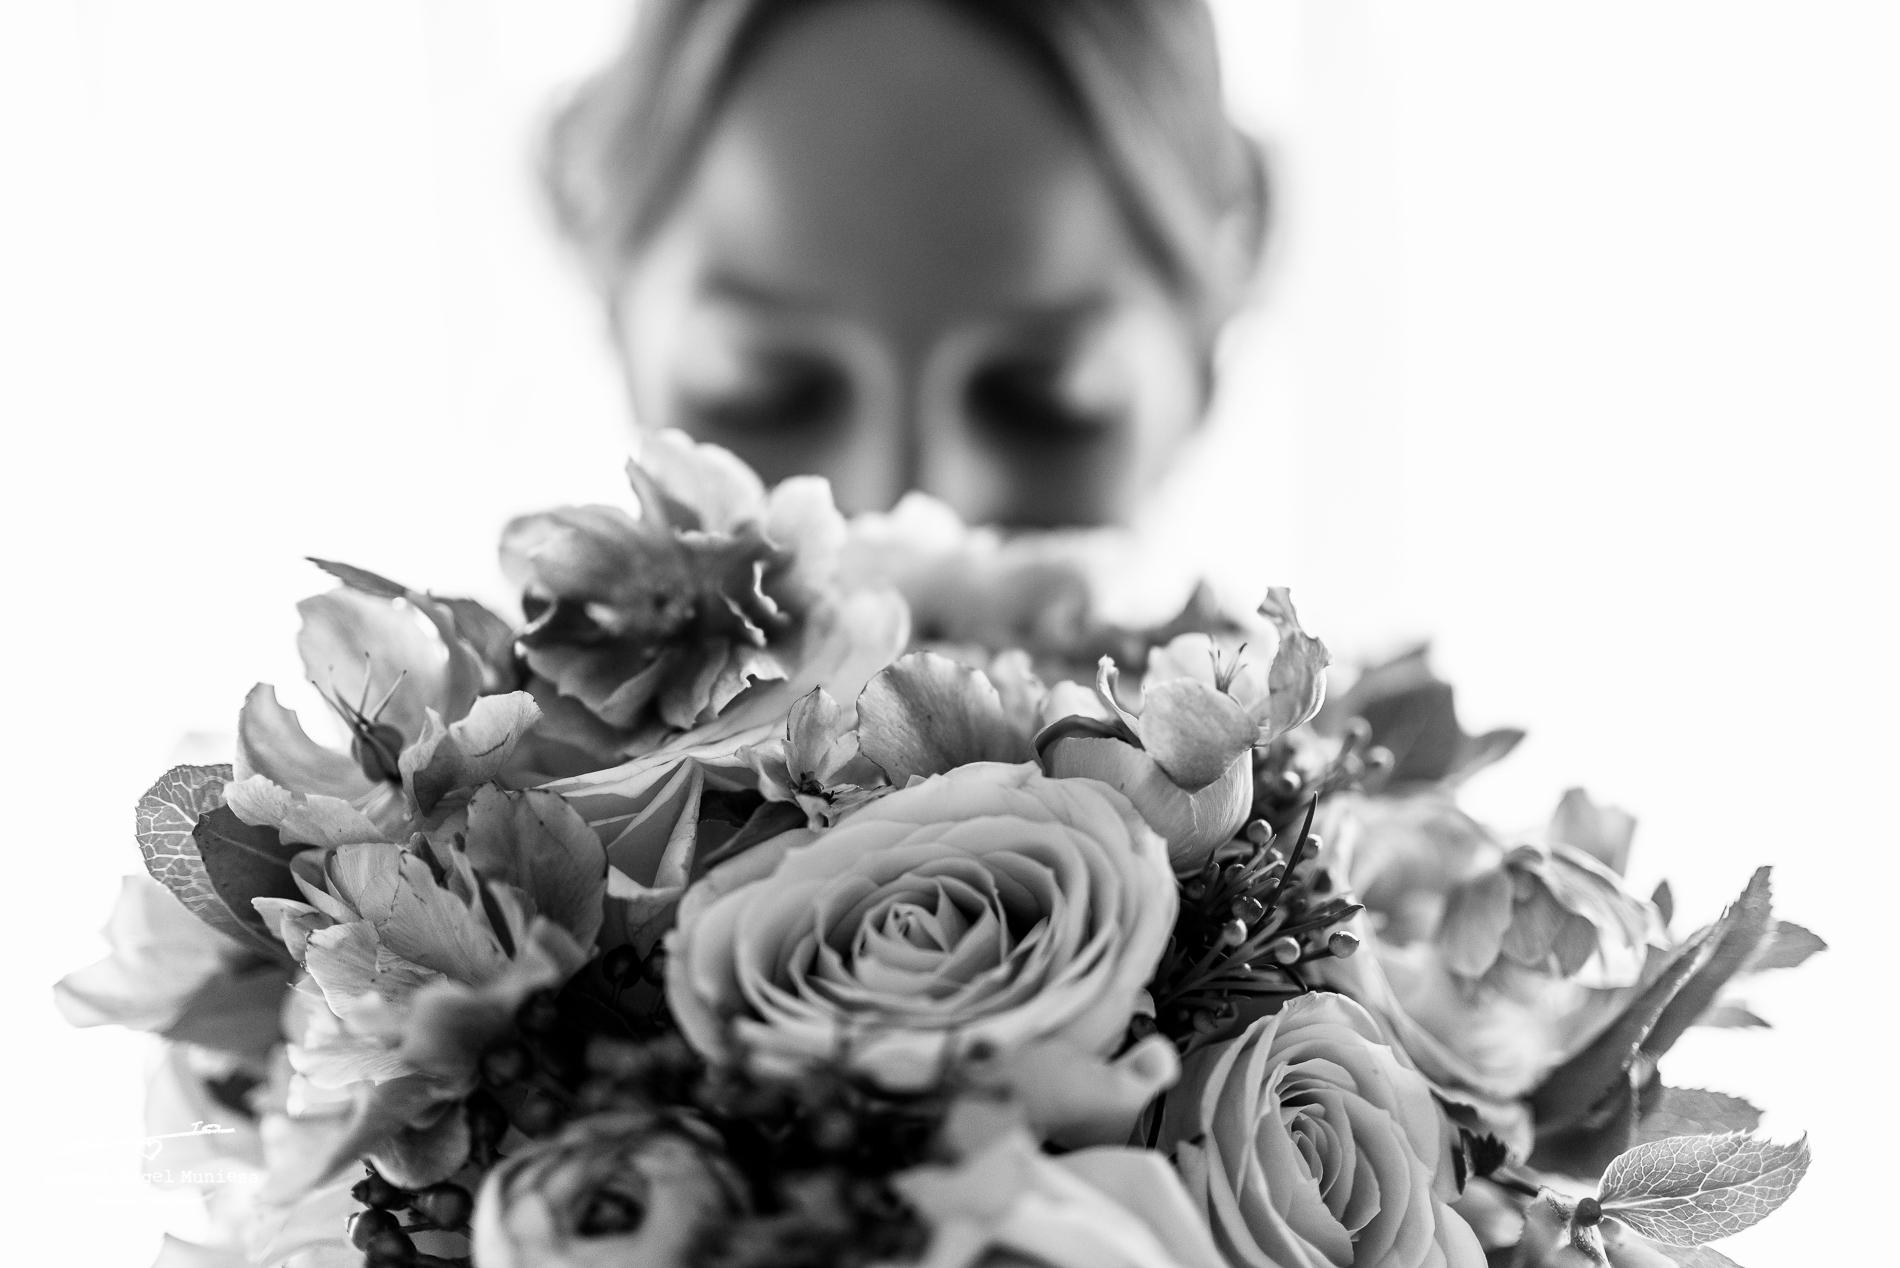 miguel angel muniesa, fotografo boda Teruel, fotografo boda navarra, fotografo boda zaragoza, fotografo boda soria, miguel angel muniesa emotional photography_12